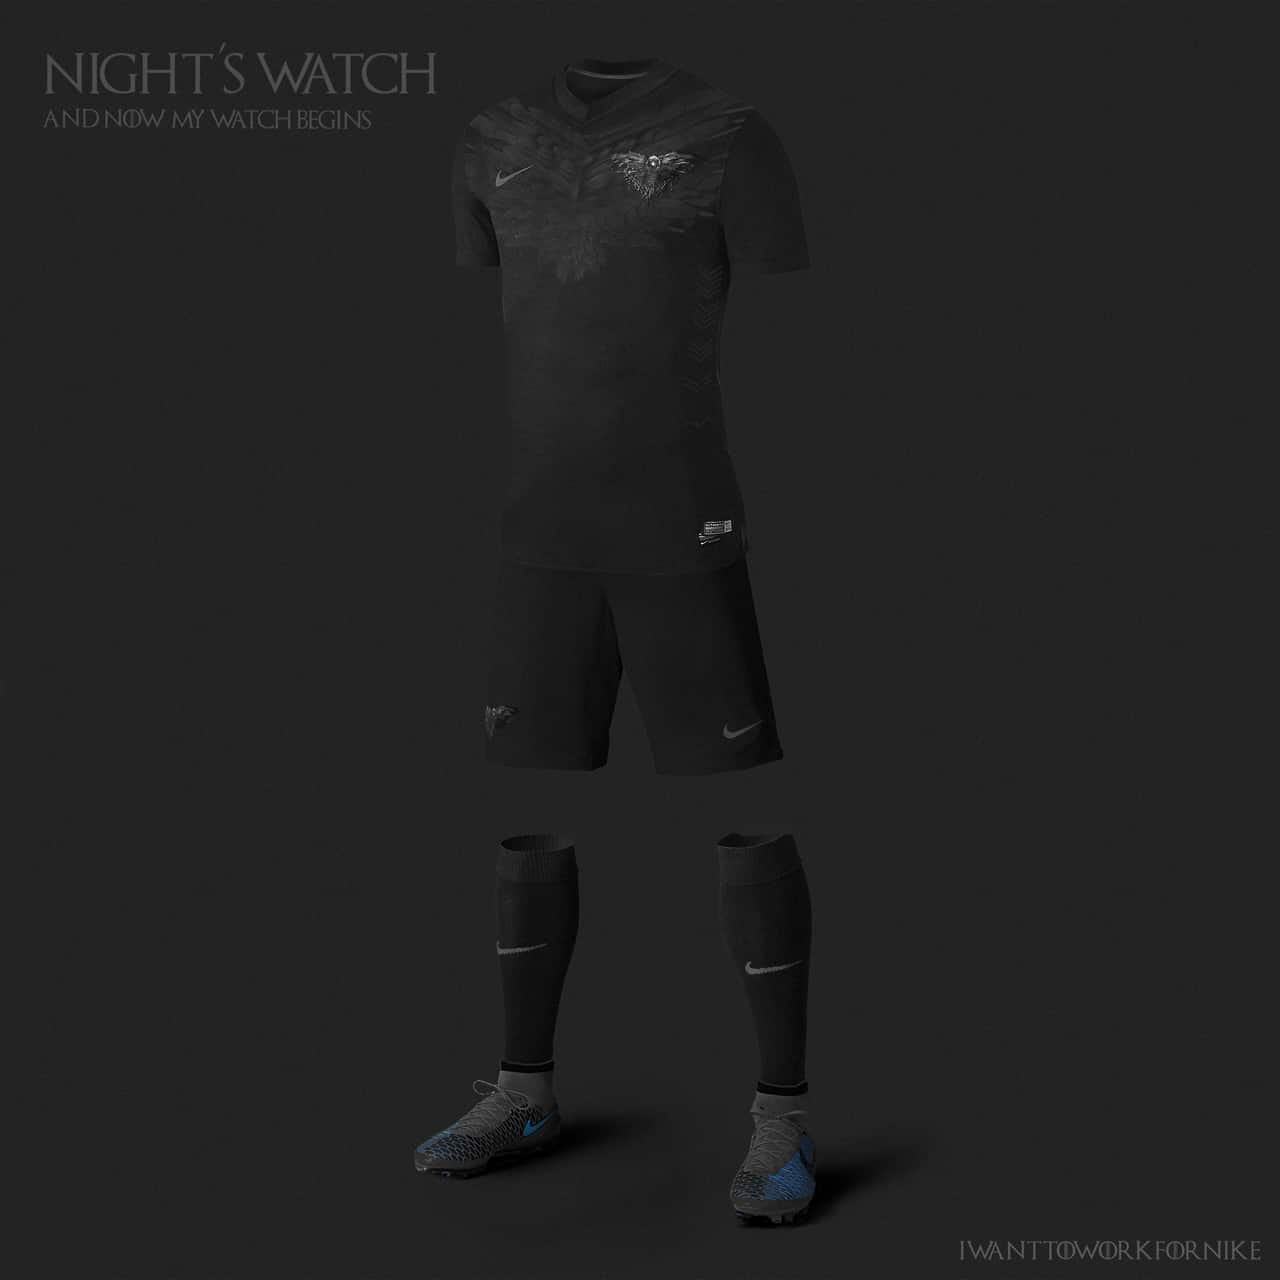 #nightswatch from #castleblack looks like #nowmywatchbegins. #Jonsnow will look nice on it. #gameofthrones #nikefootball